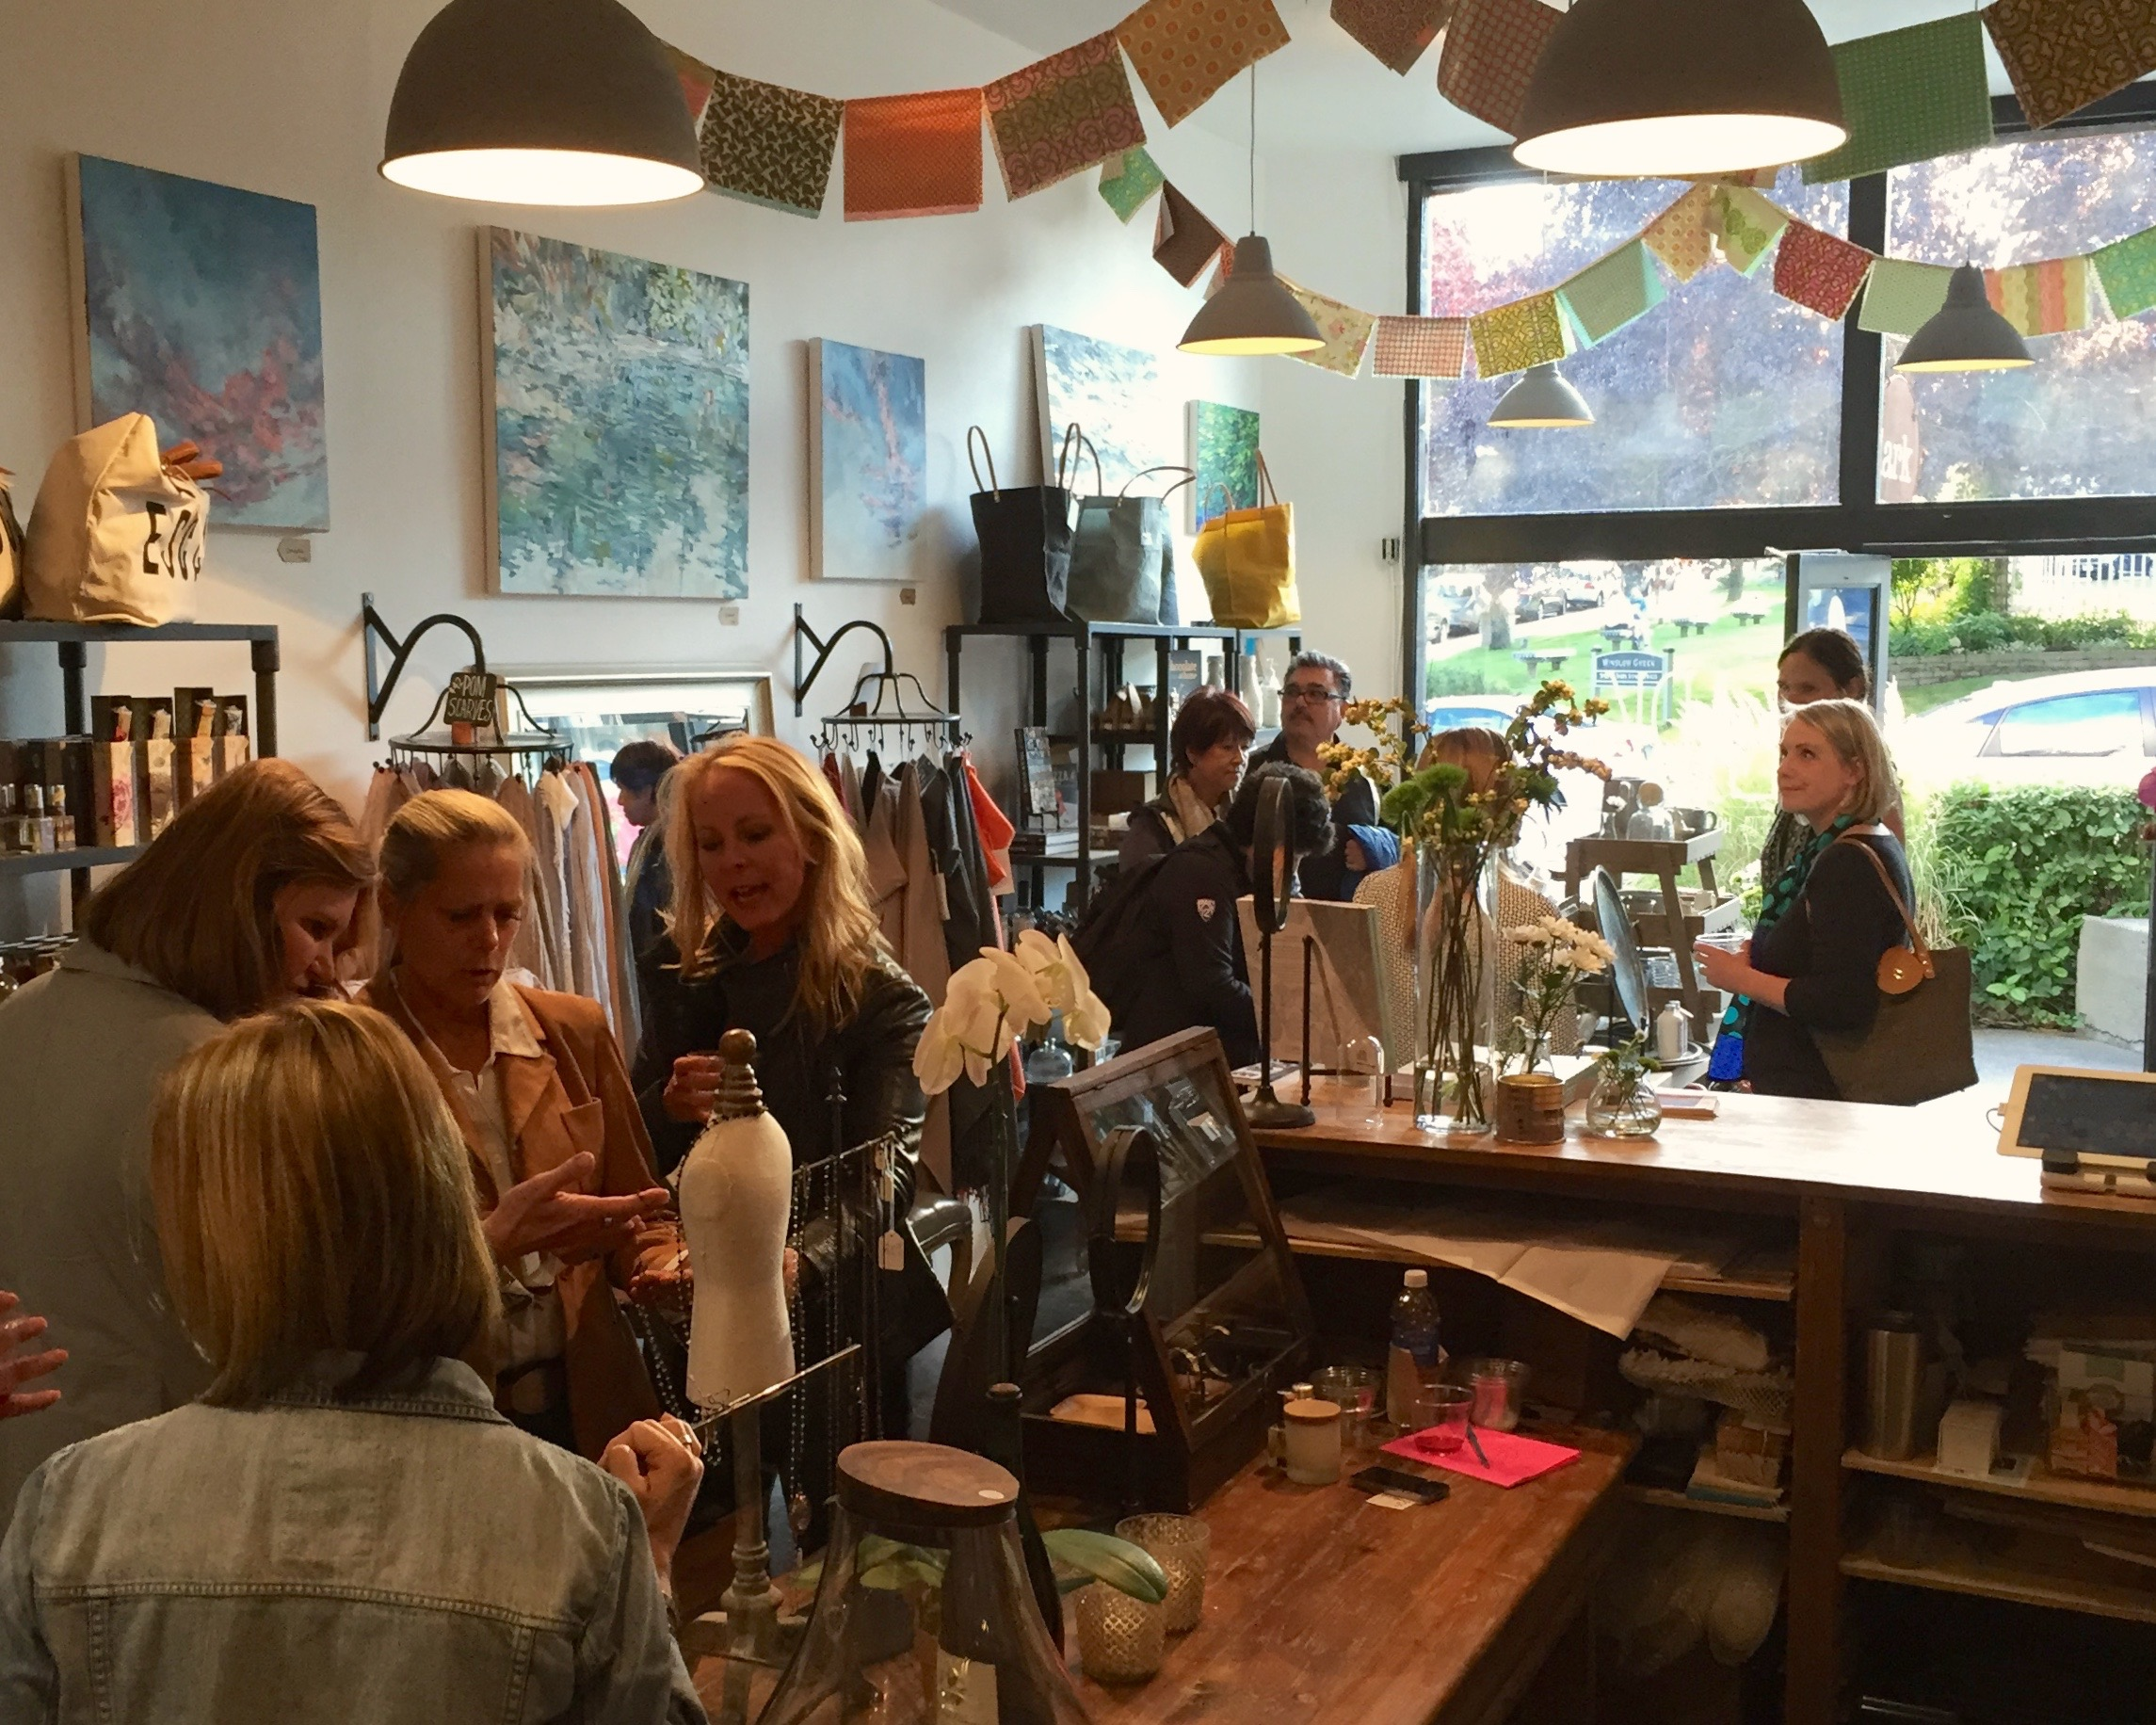 Bainbridge Island First Friday Art Walk at Lark, September 4, 2015